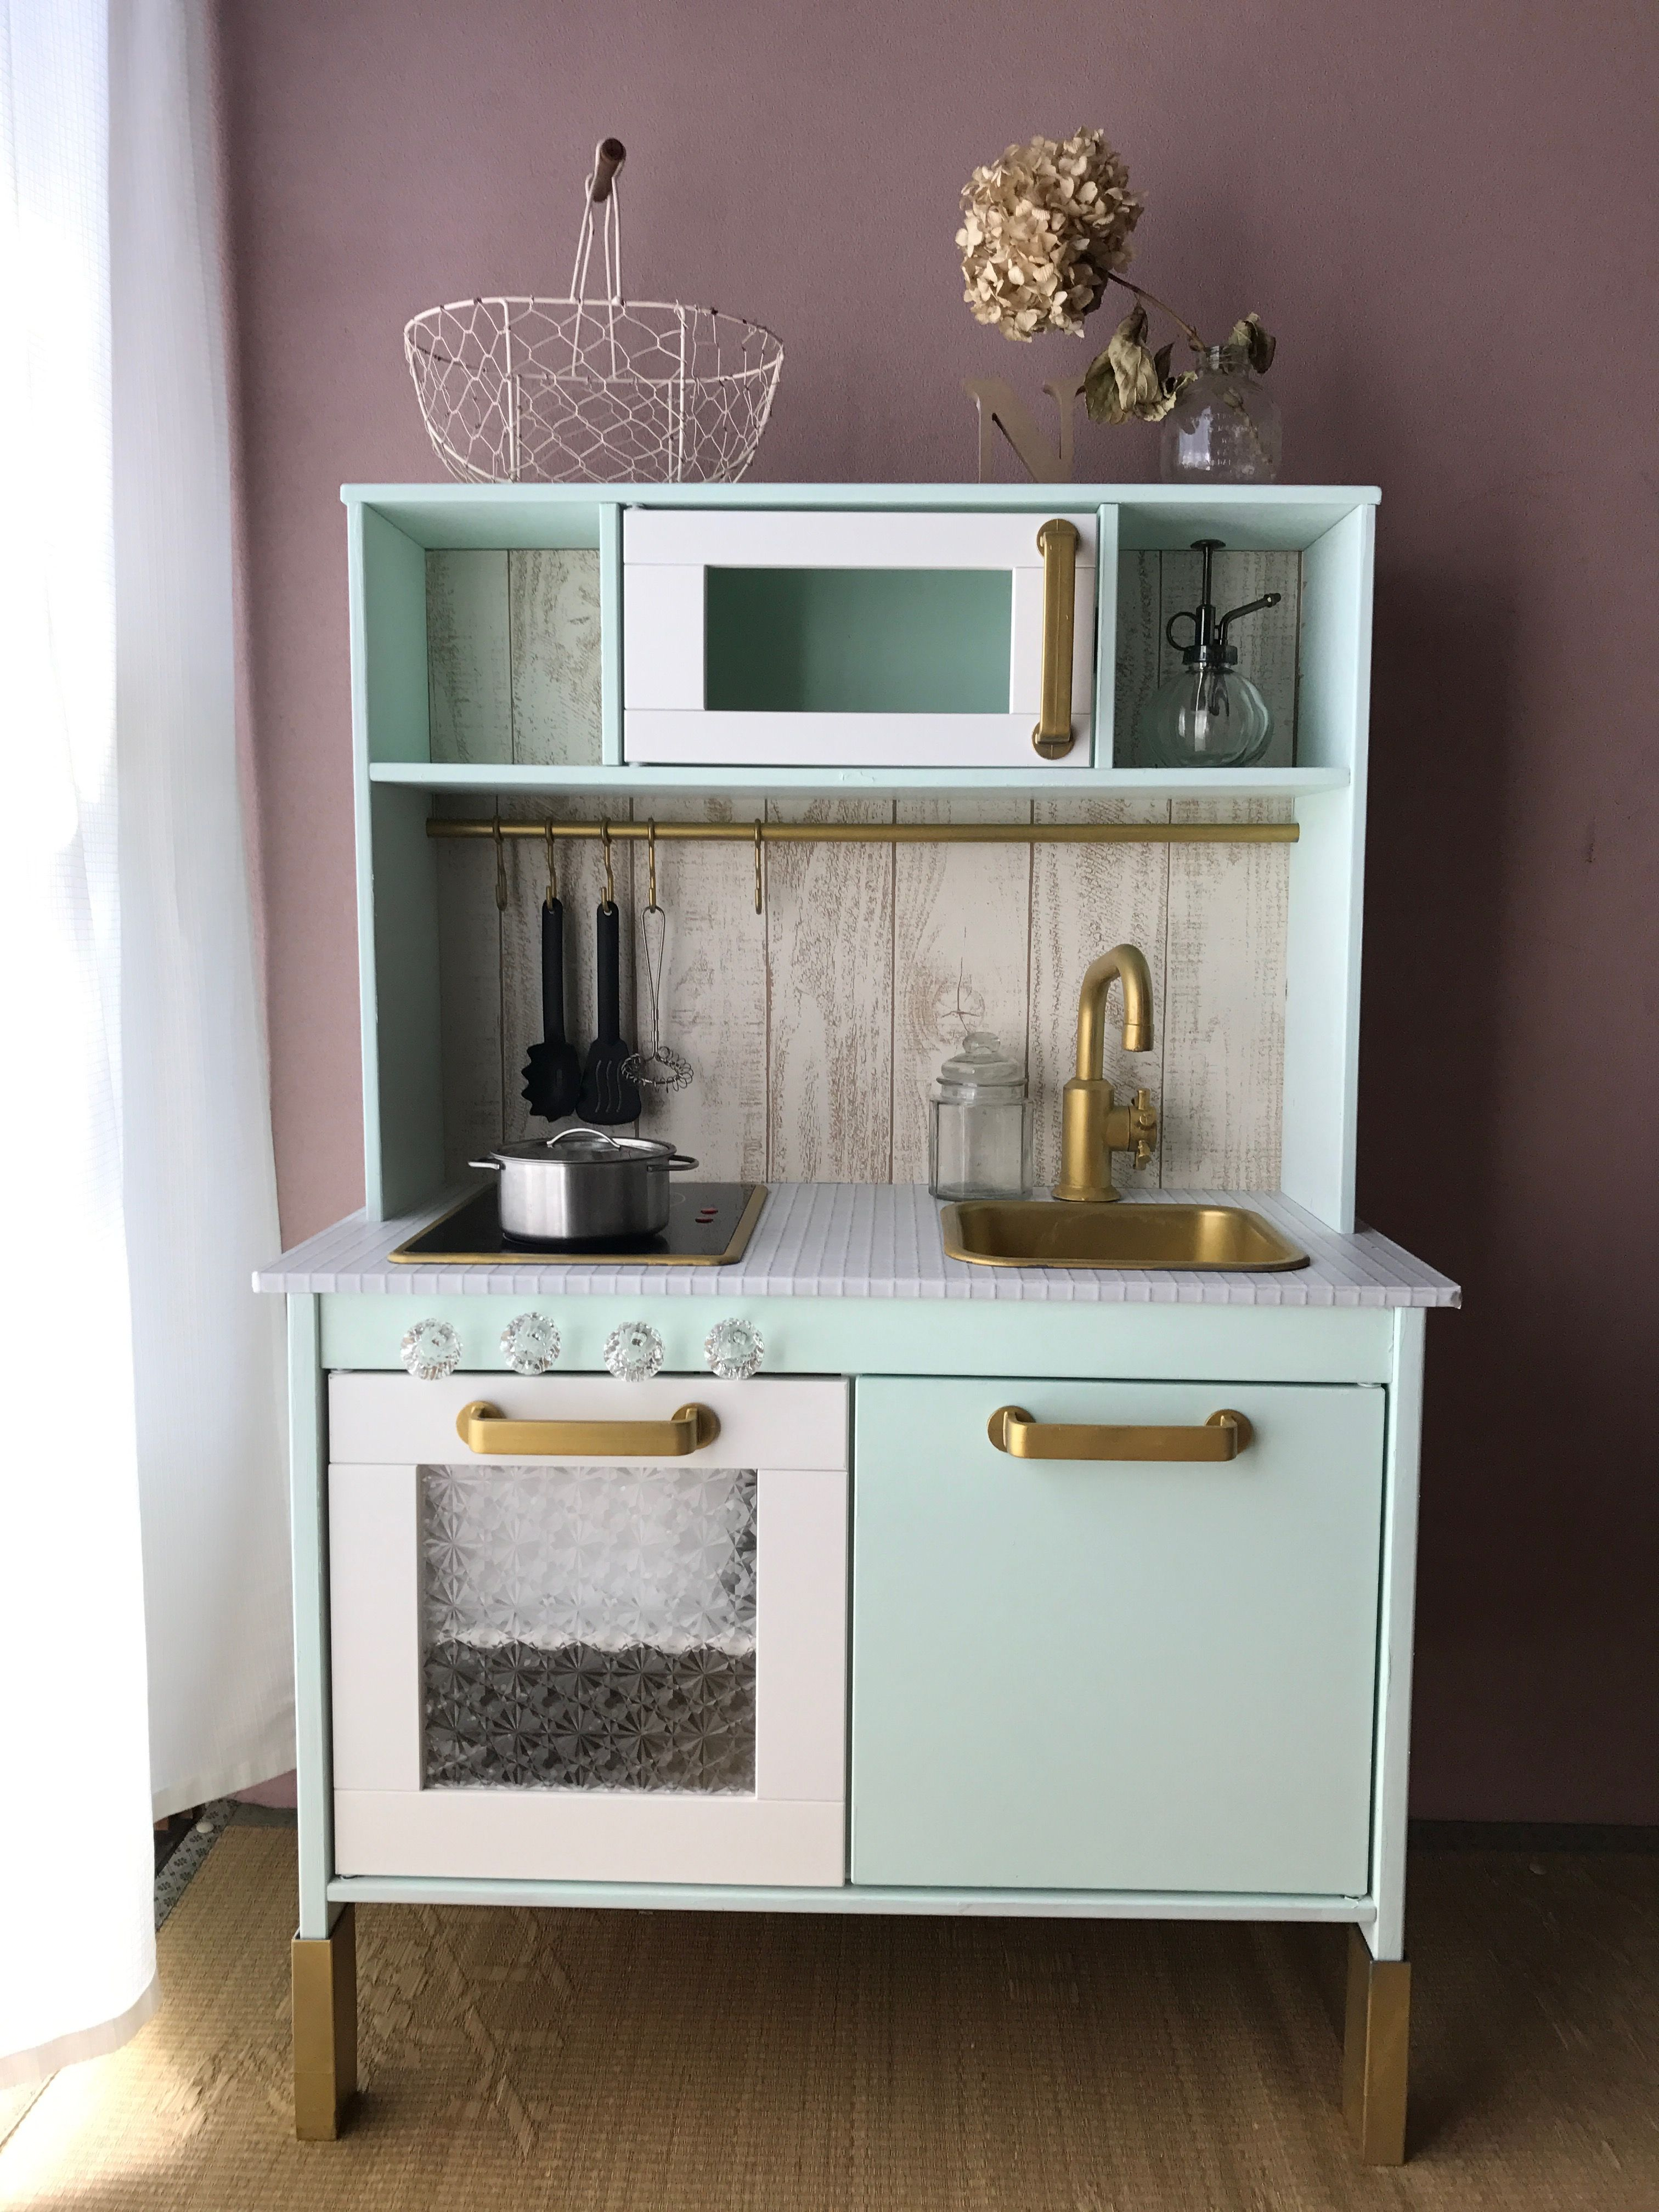 IKEA play kitchen,DIY   cucina bimbi ikea in 2018   Pinterest ...